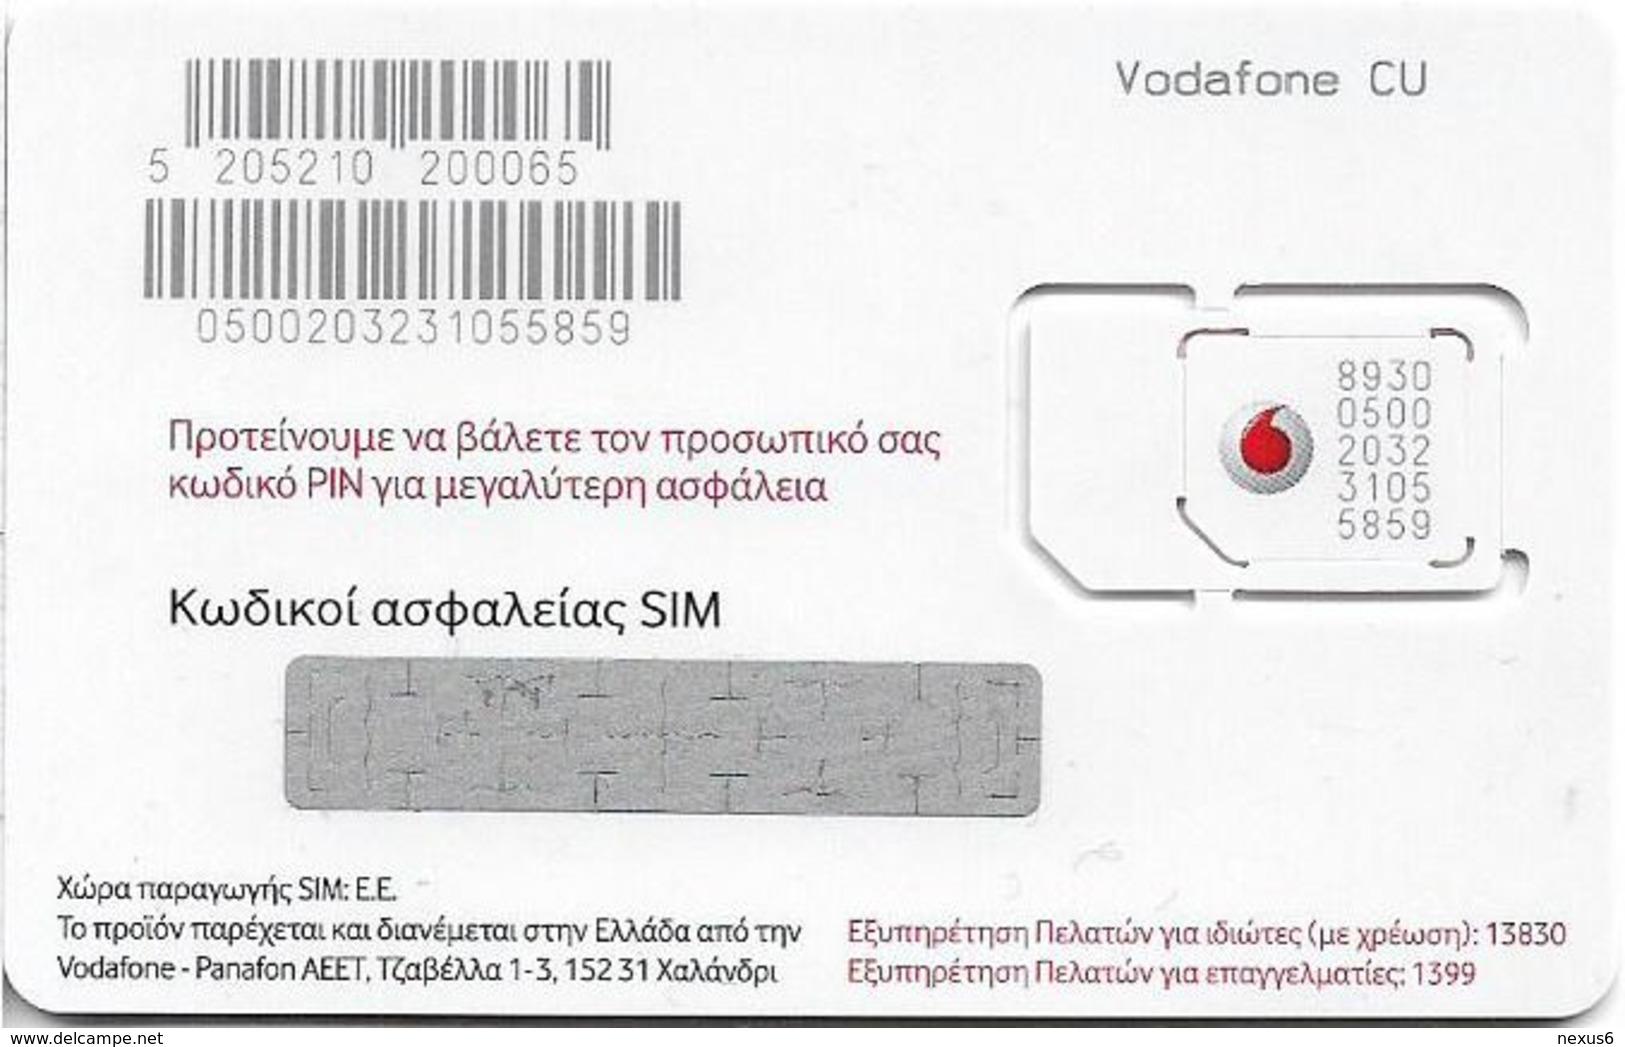 Greece - Vodafone (Red & White 'Vodafone CU') GSM SIM, Mint - Greece